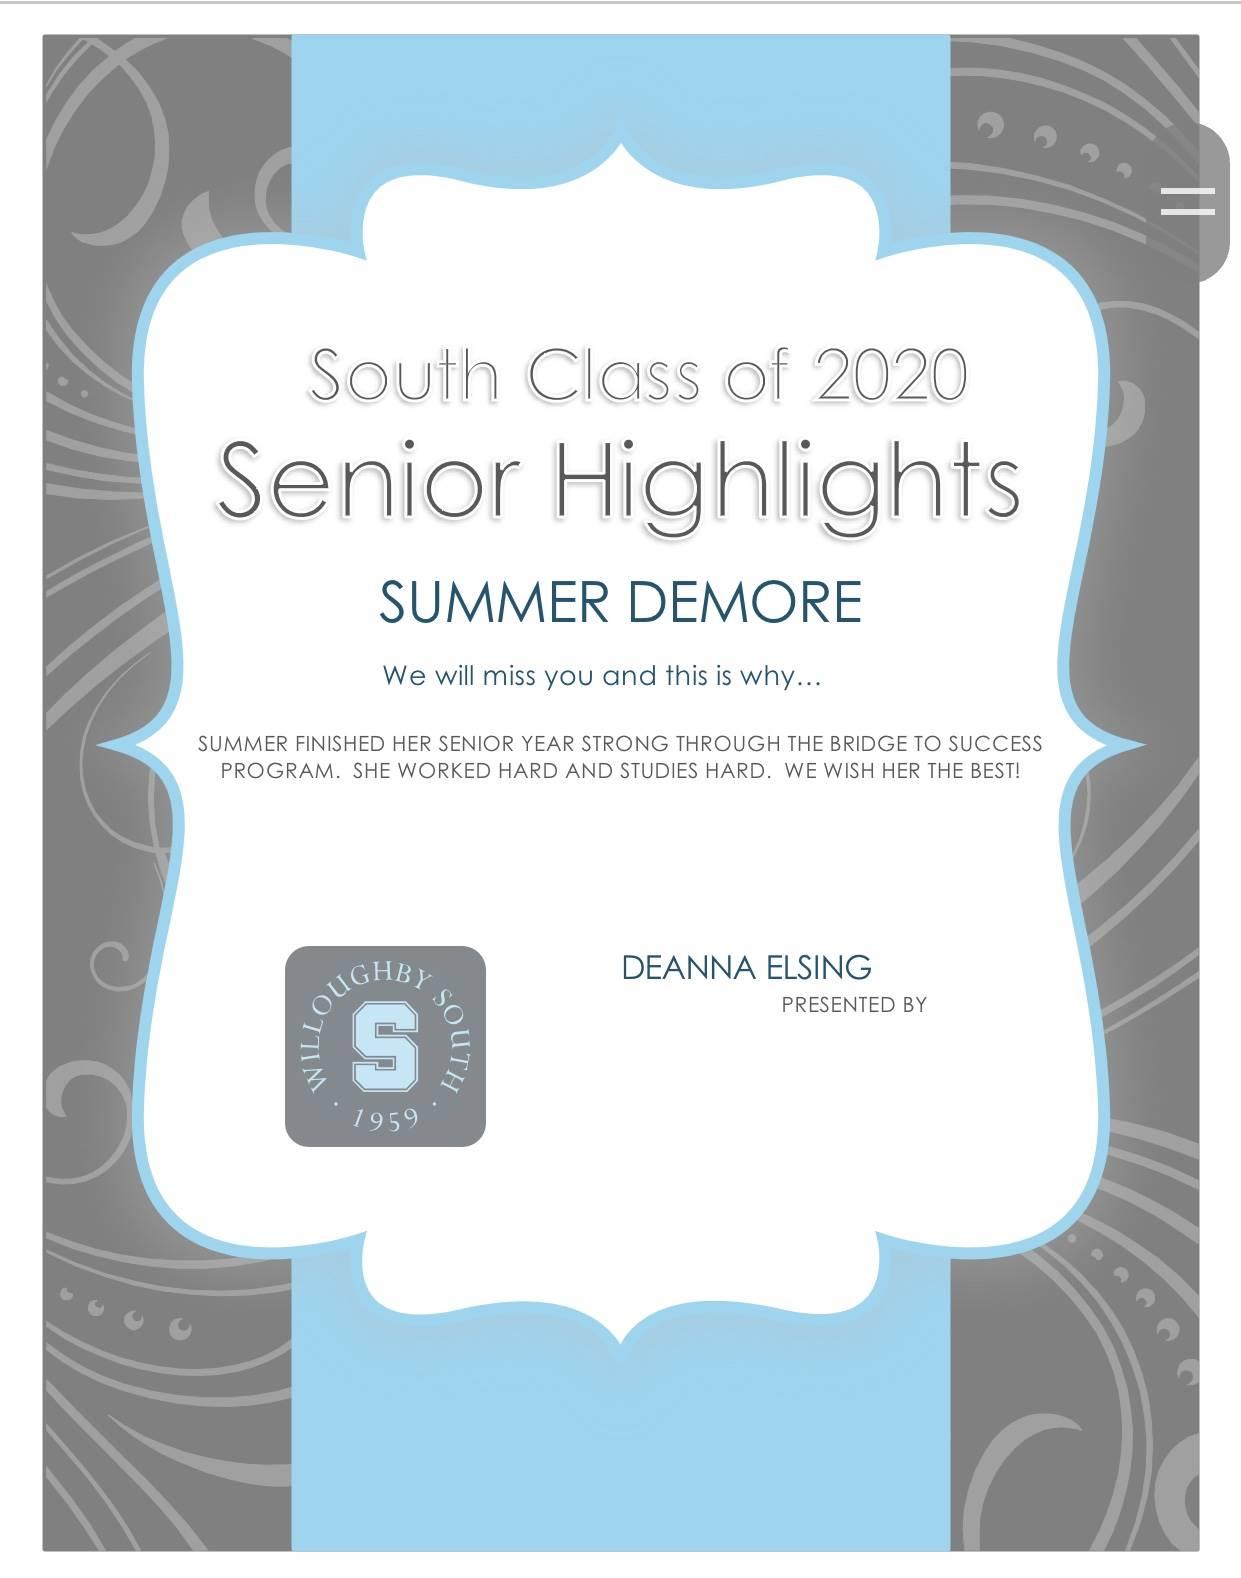 Summer DeMore